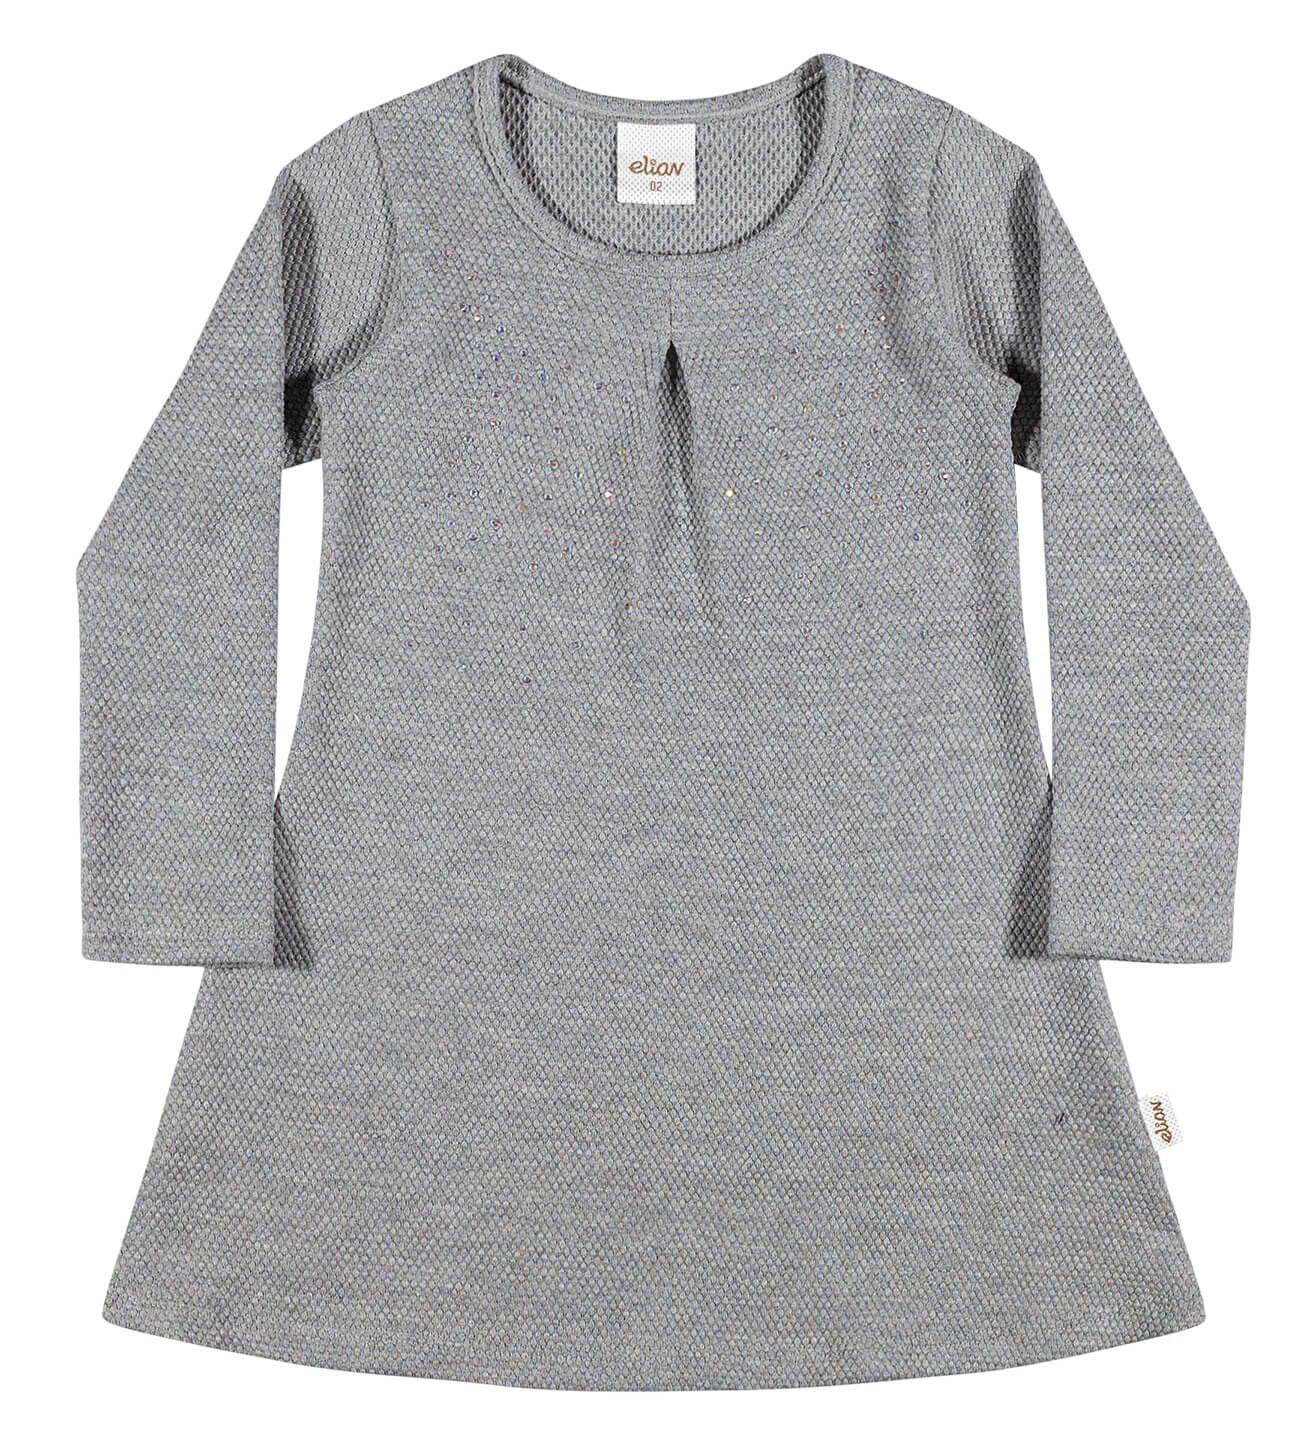 48f558f36 Vestido Infantil Feminino Cinza Inverno Elian | Armário Infantil